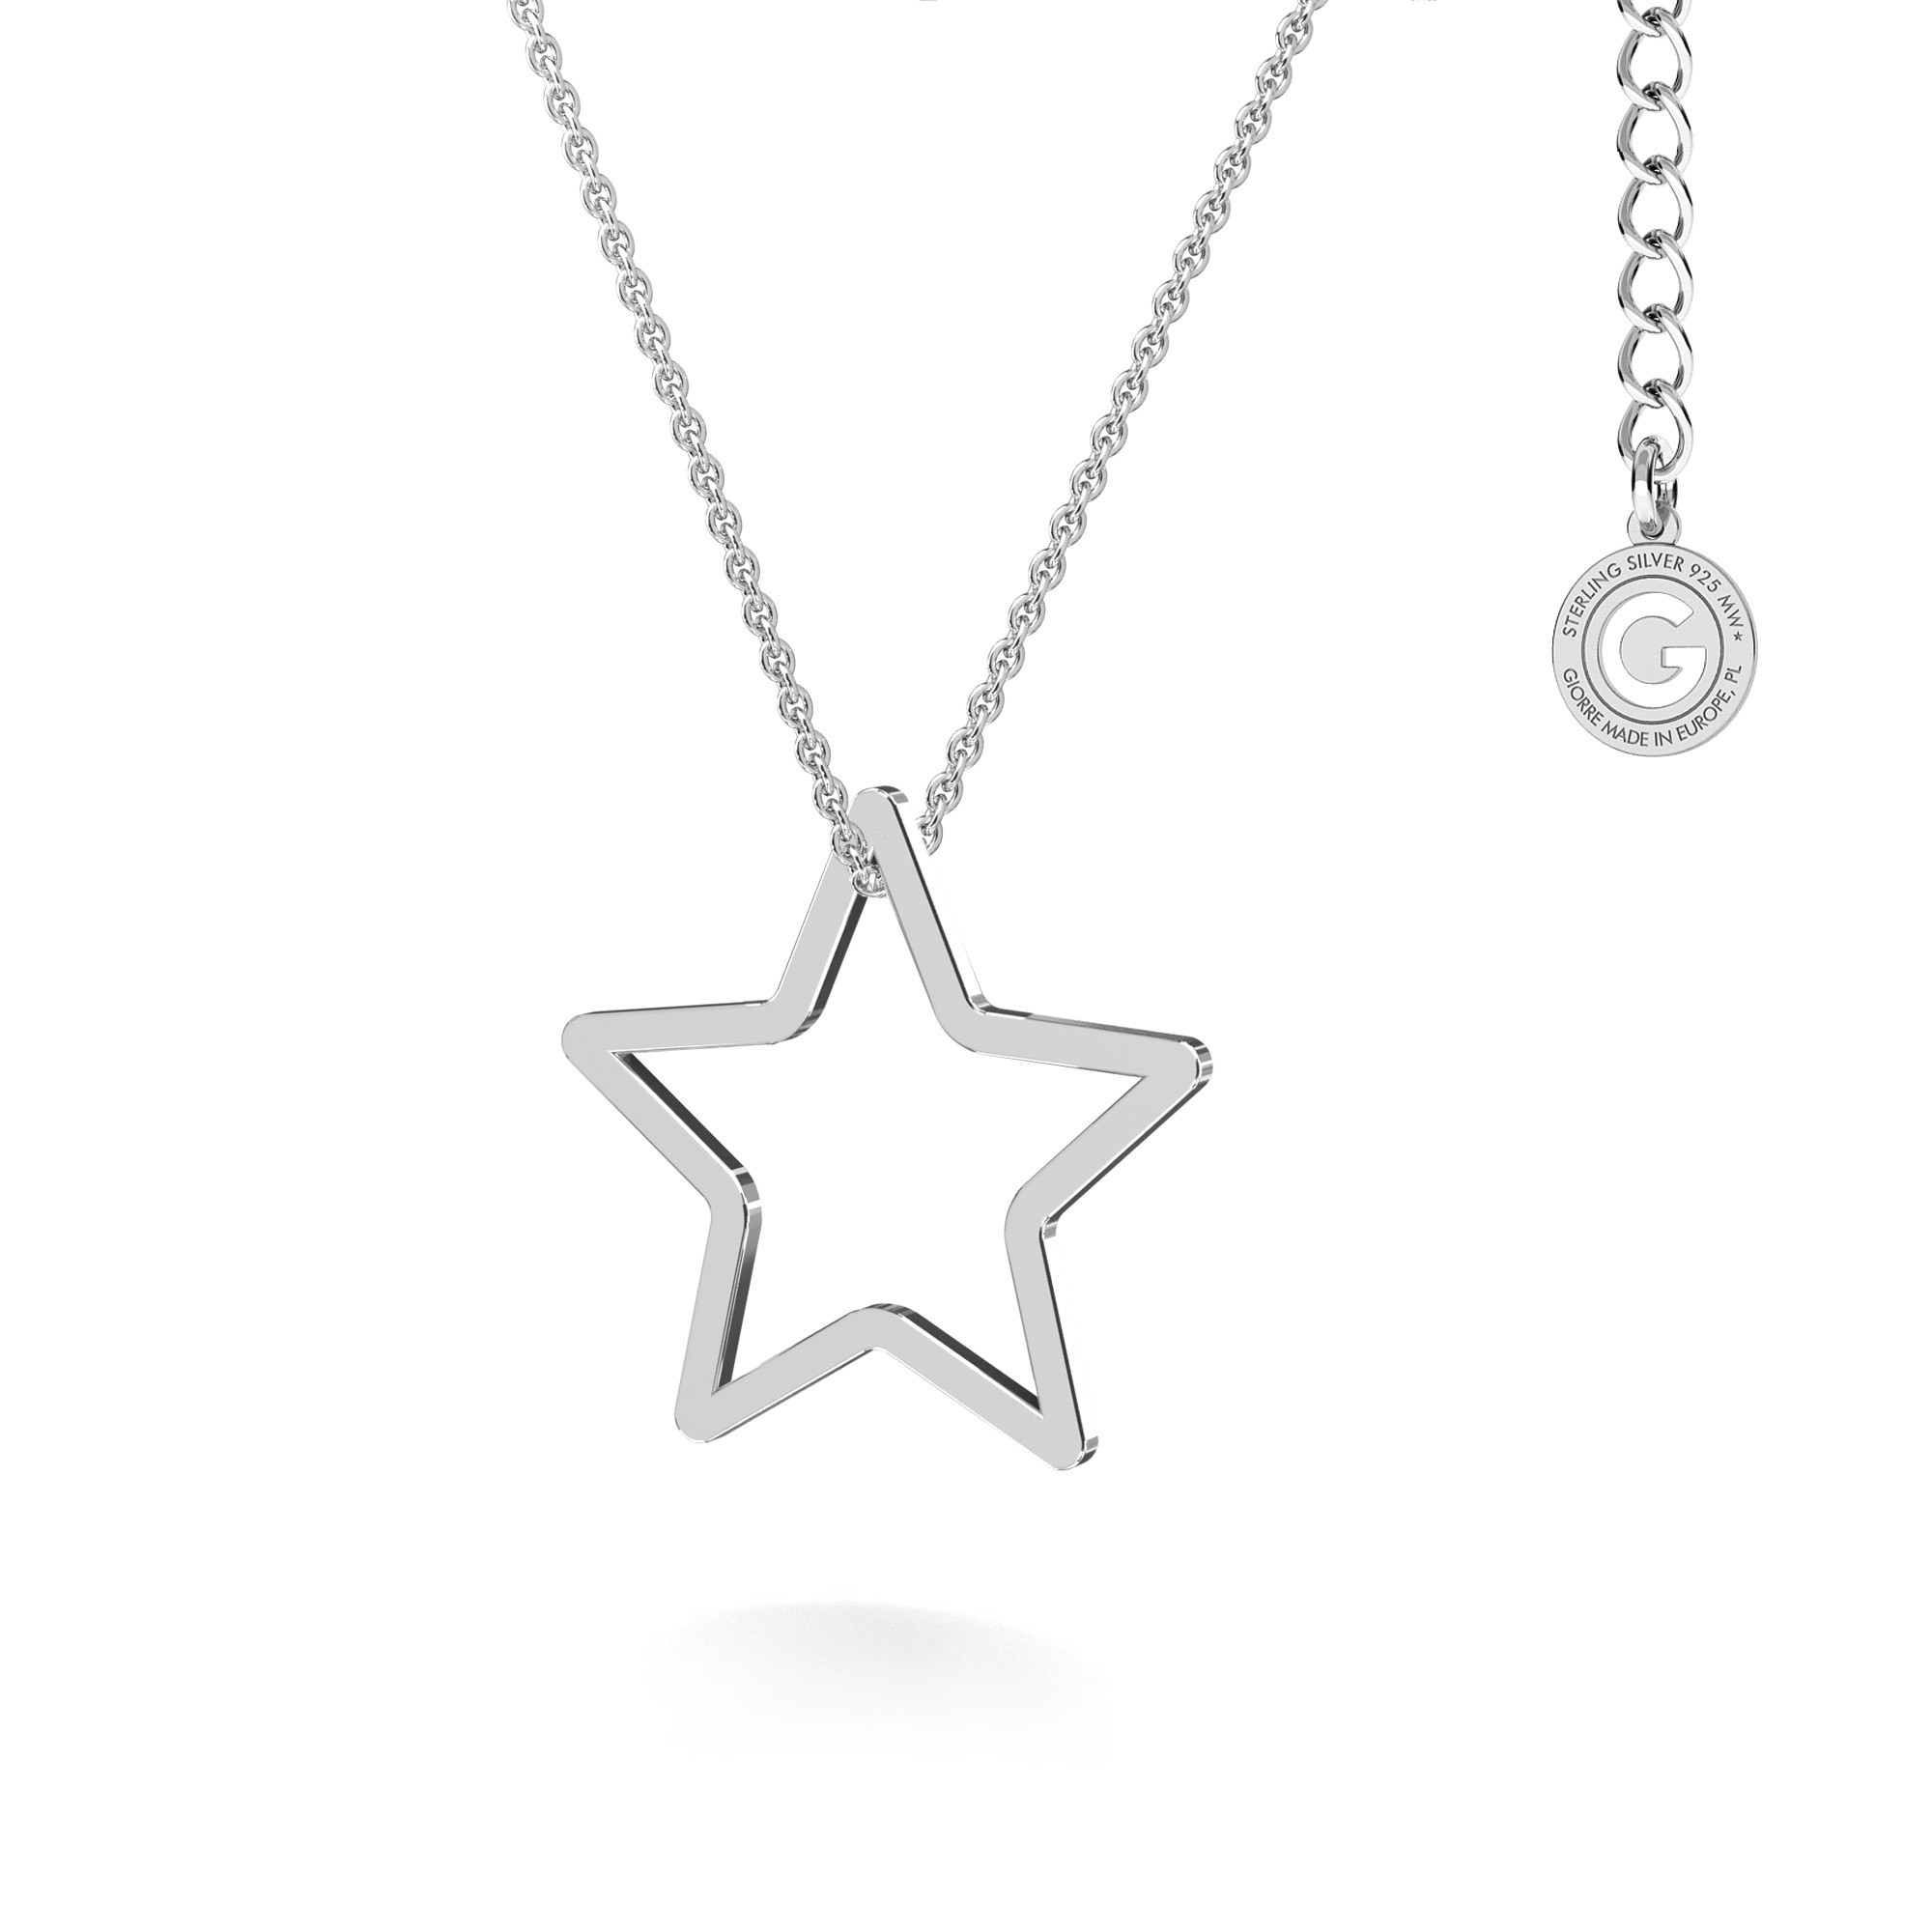 Silver openwork star necklace MON DÉFI, silver 925